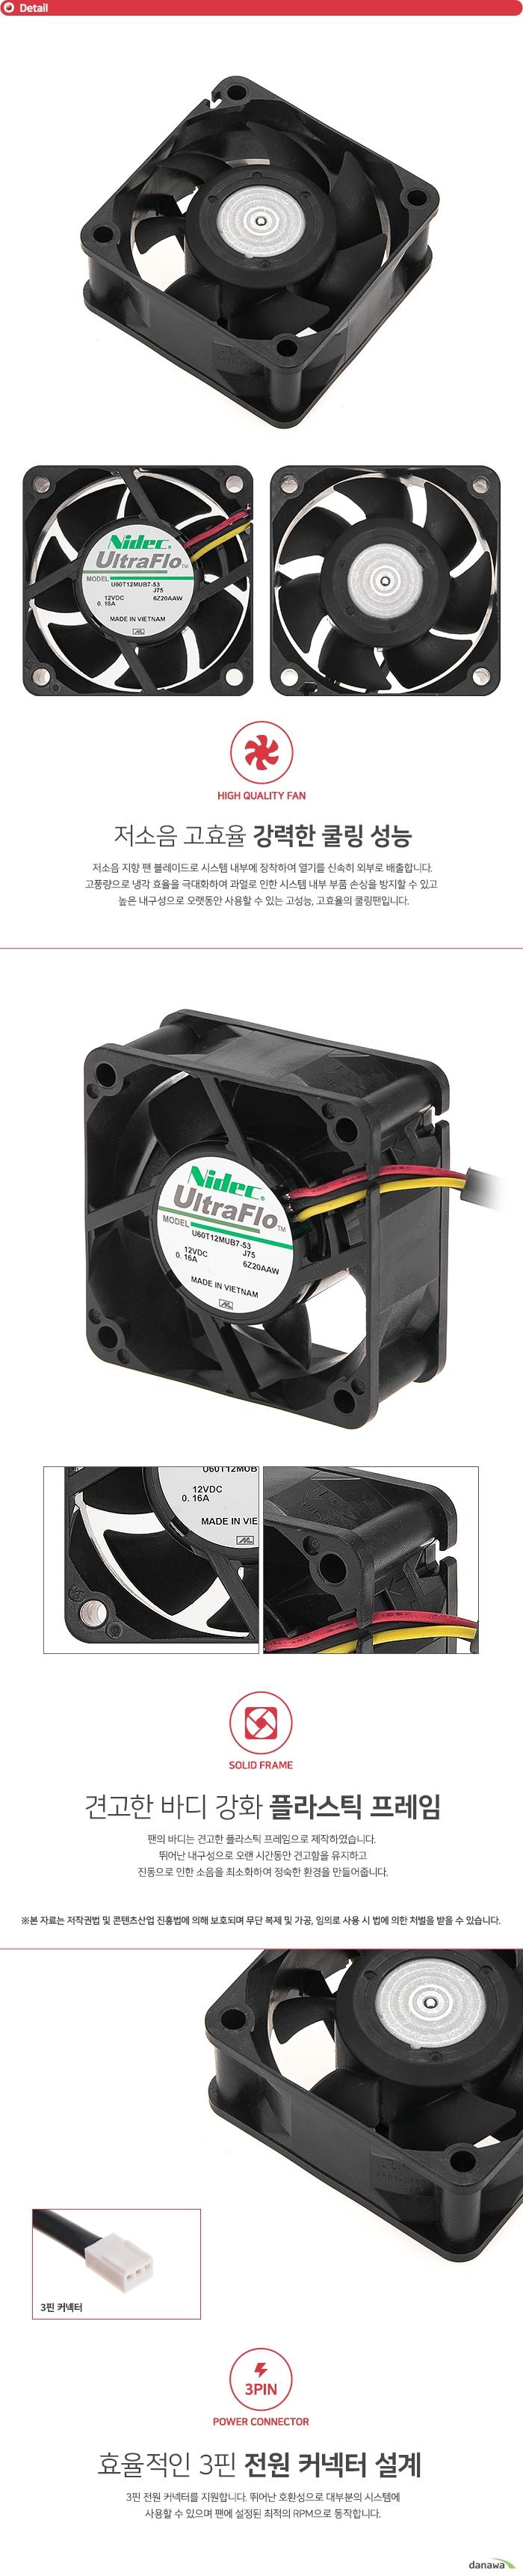 Nidec UltraFio U60T12MUB7-53